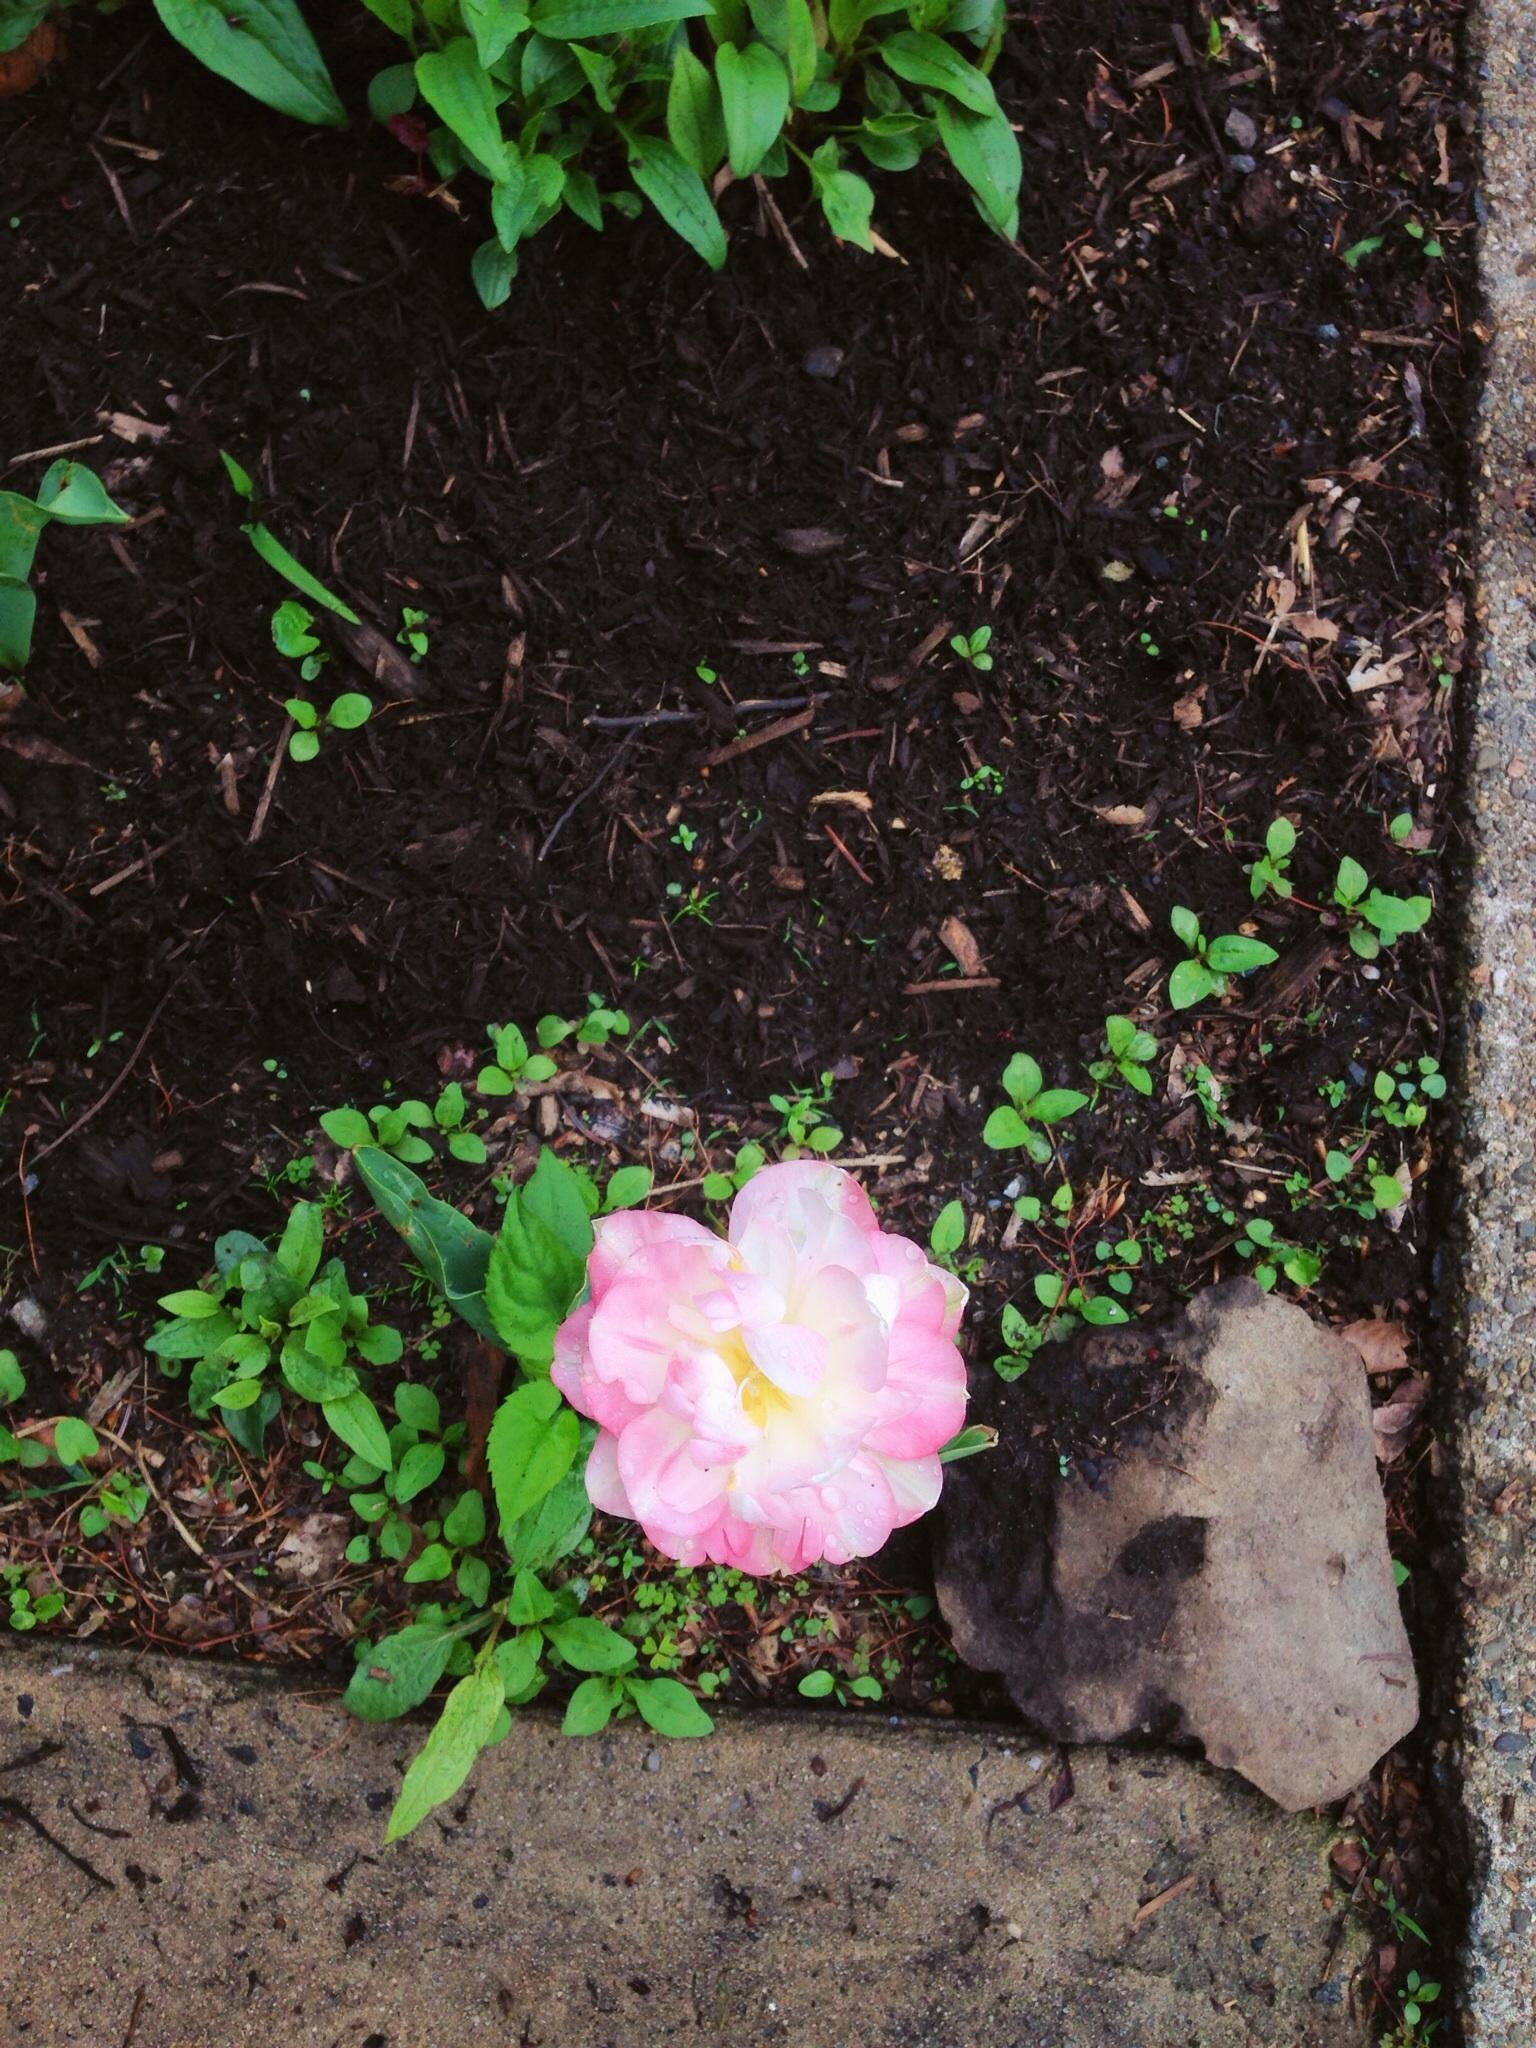 Chuck's current favorite flower downstairs in the garden